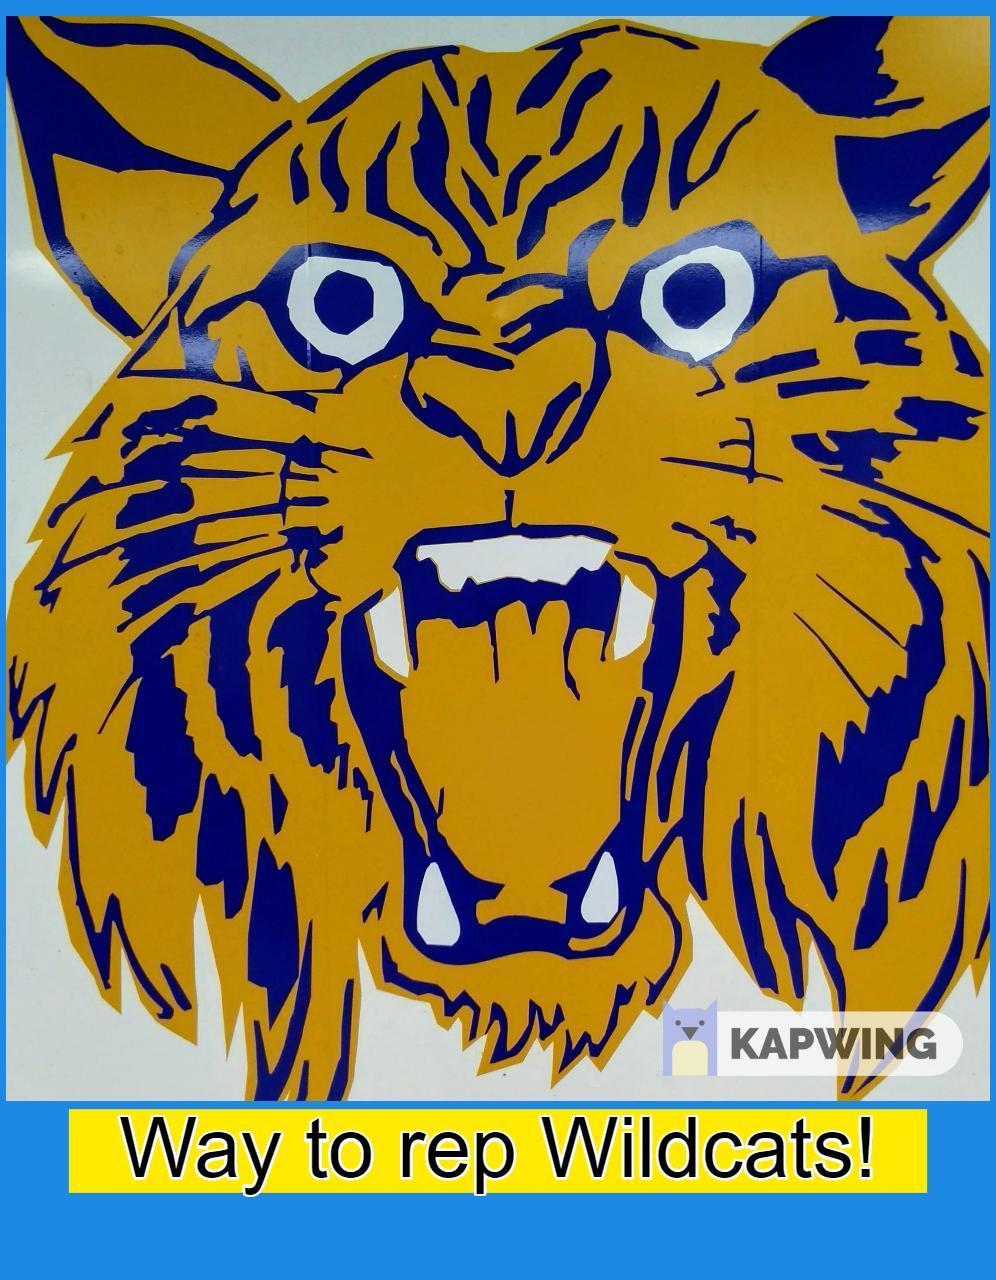 Wildcat logo with 'Way to rep Wildcats' caption